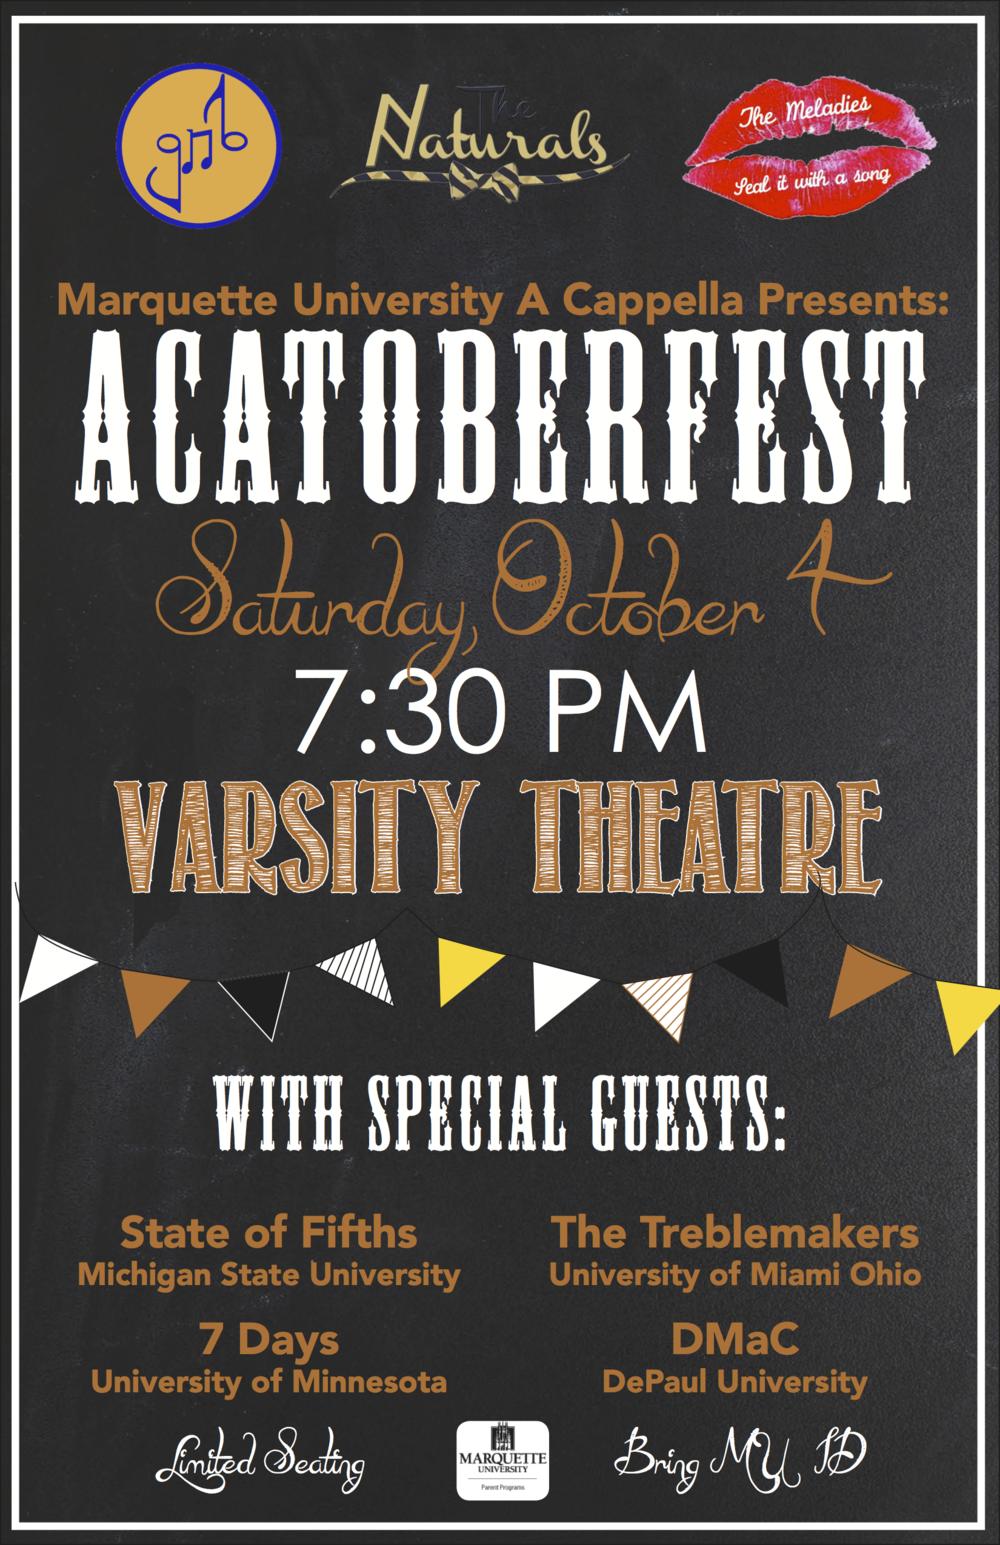 Acatoberfest poster (fuh dayz)